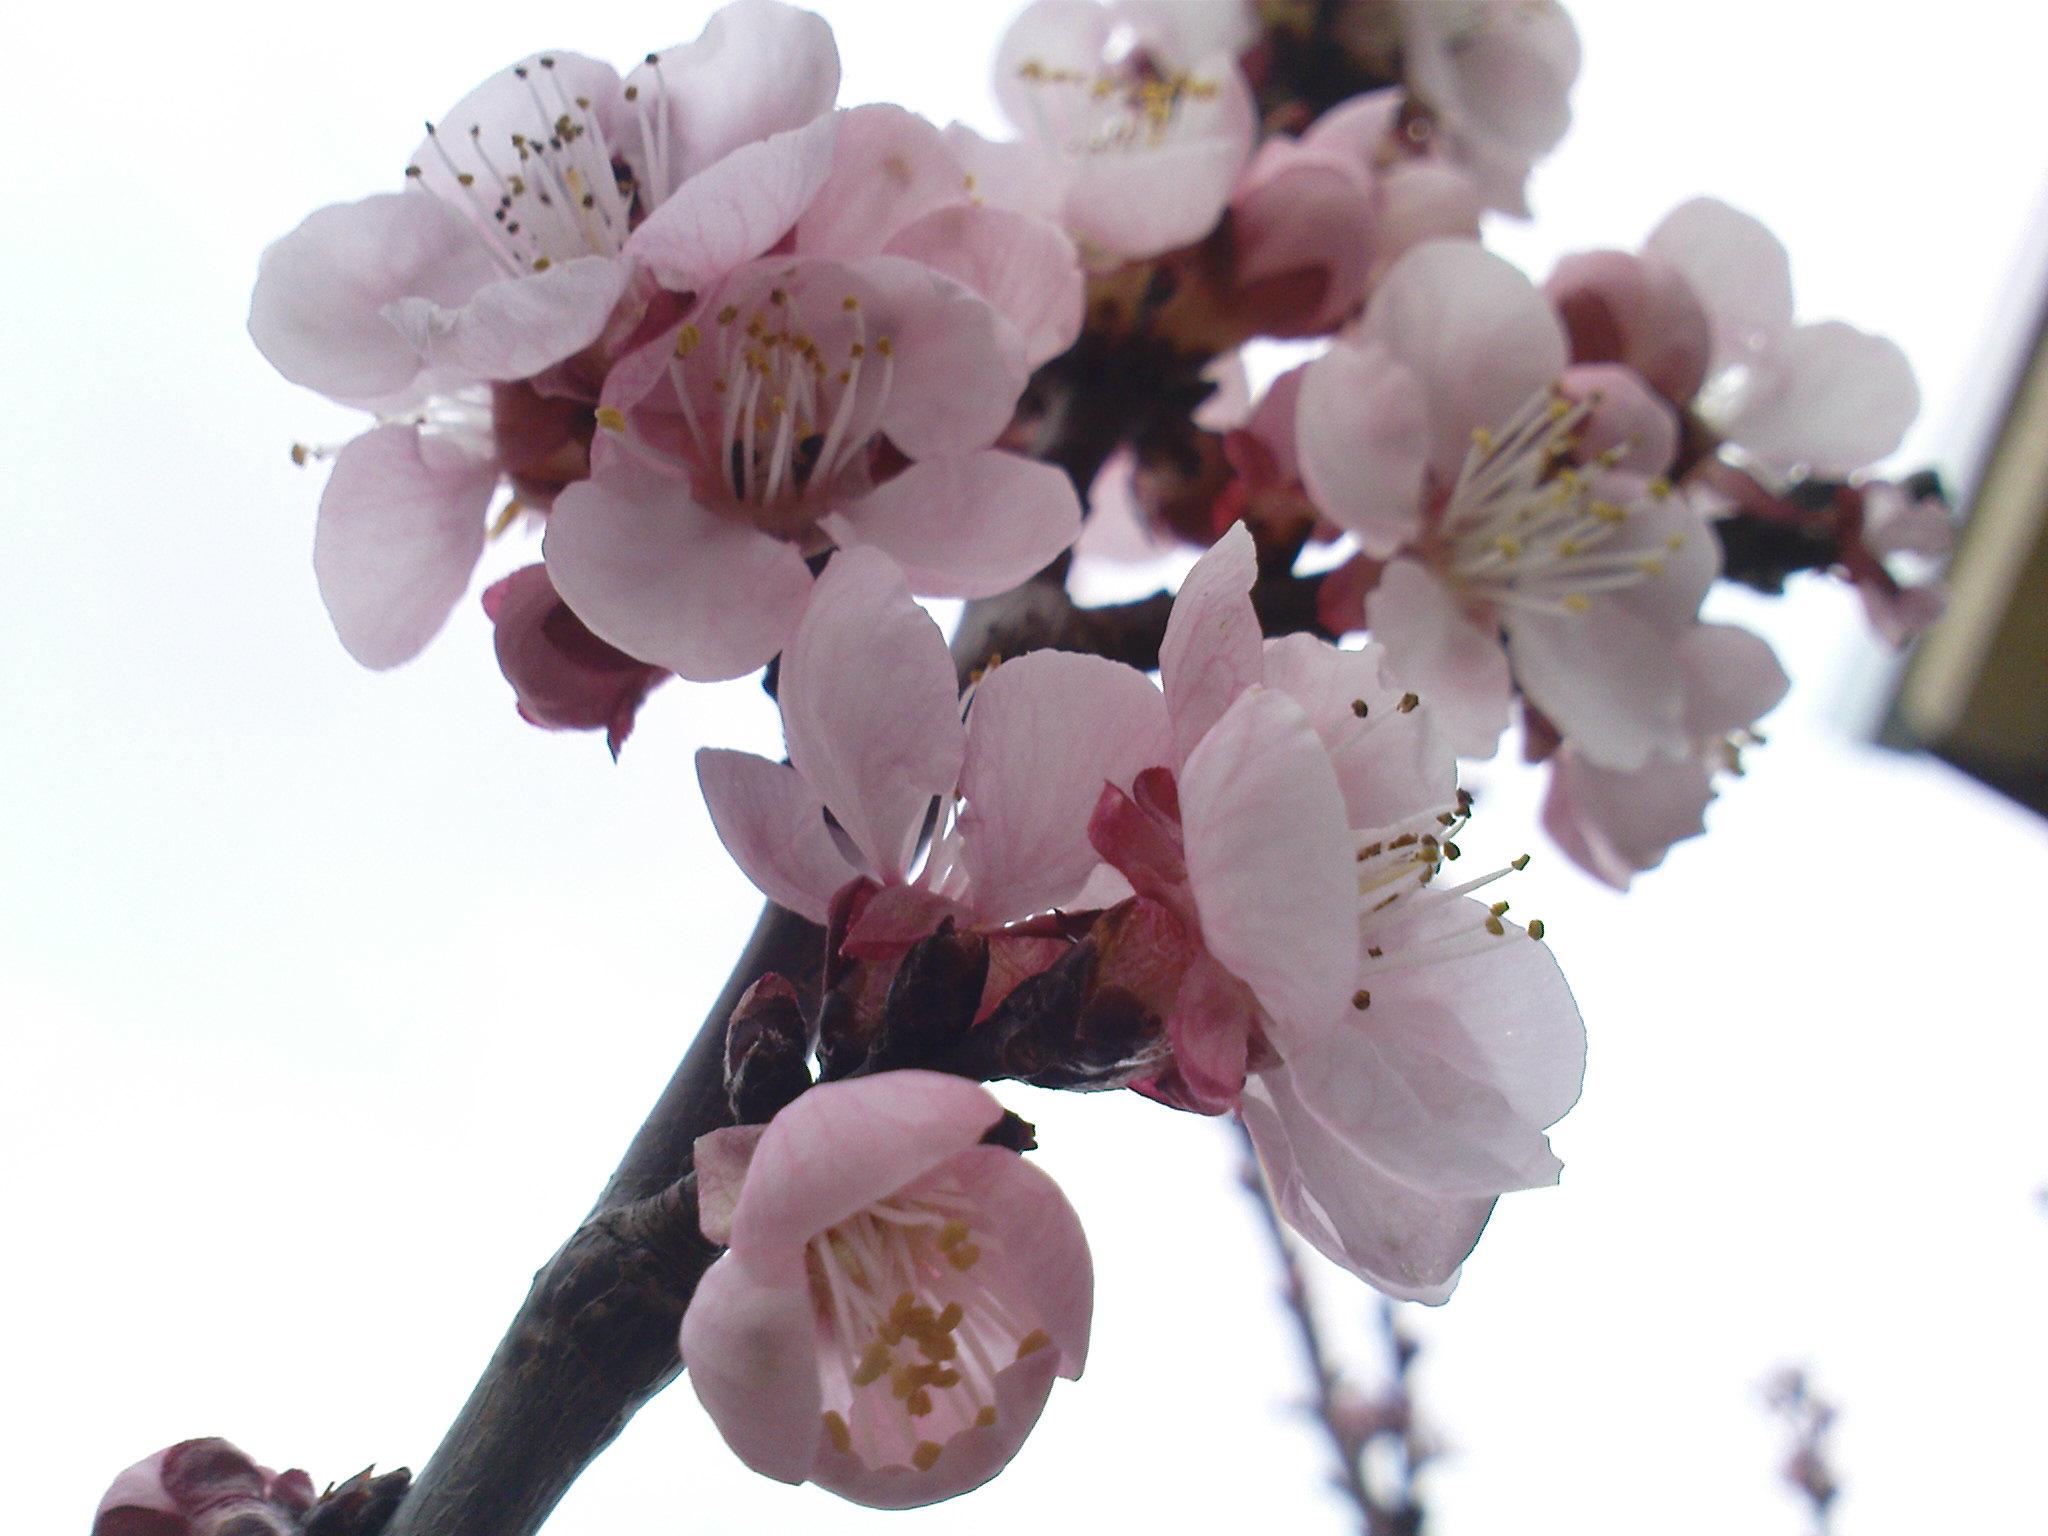 oshteteni cvetovite na kajsijata vo tikveshkiot region